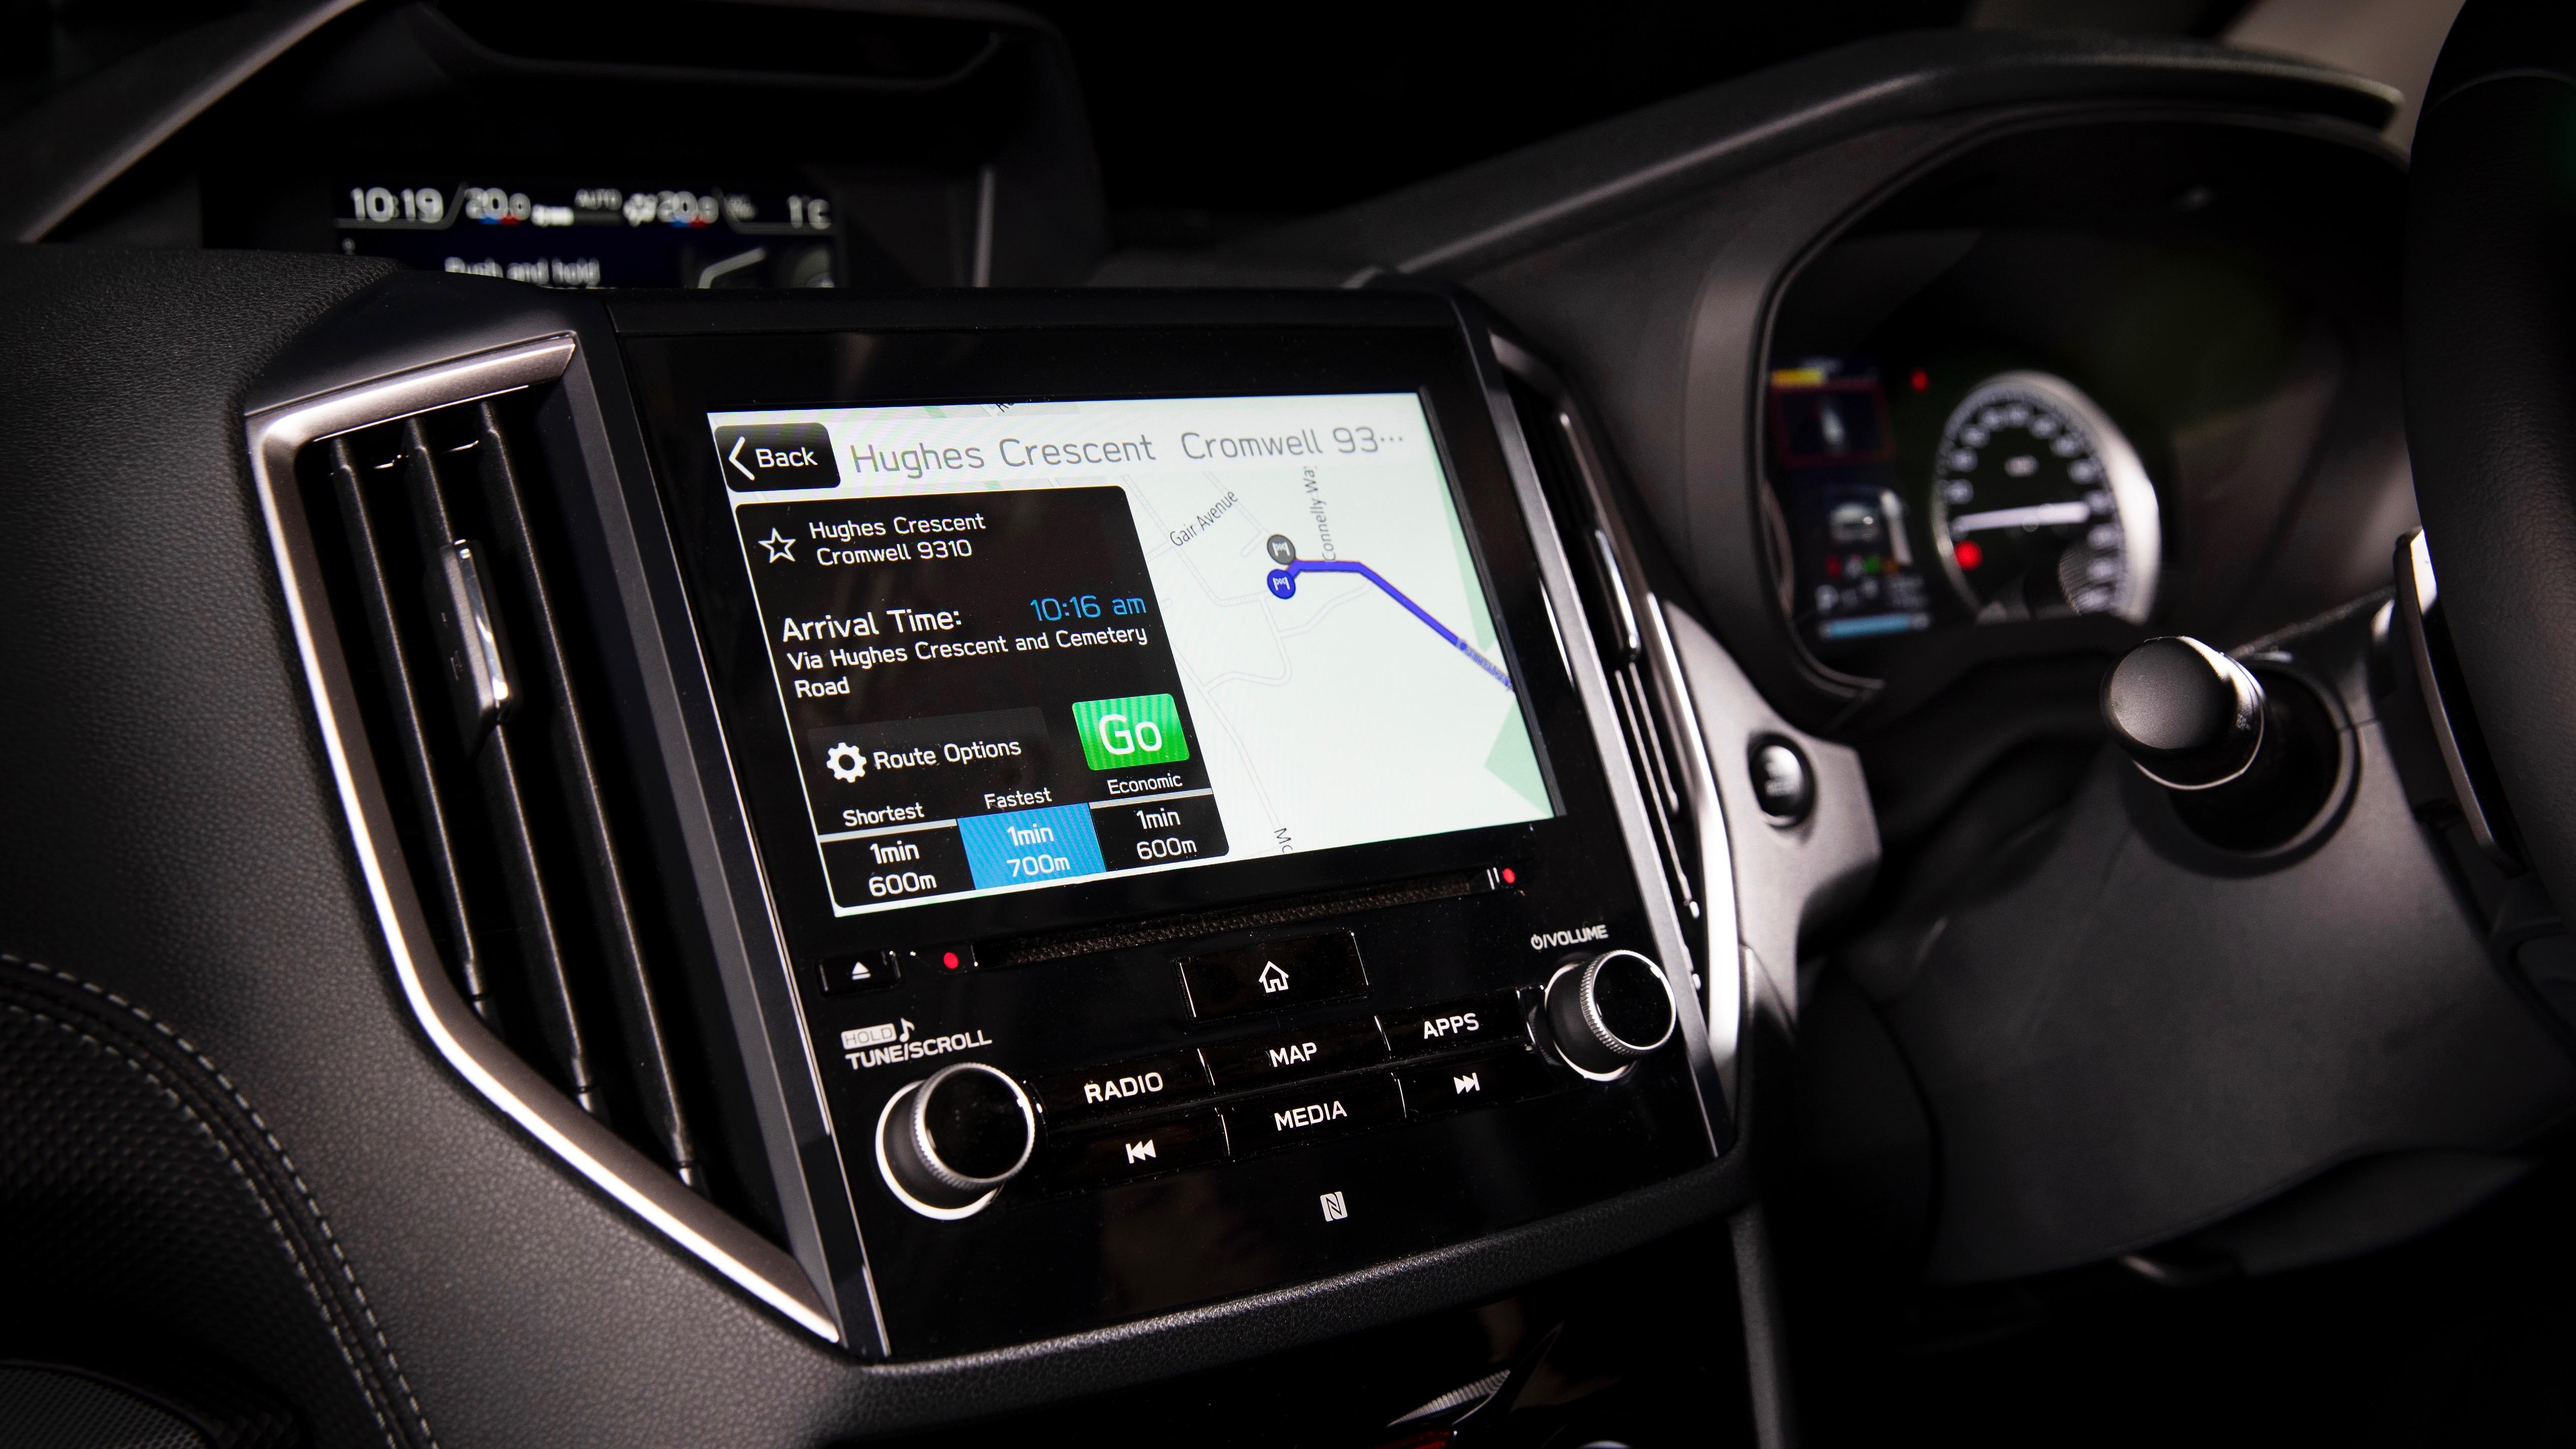 2019 Subaru Forester navigation